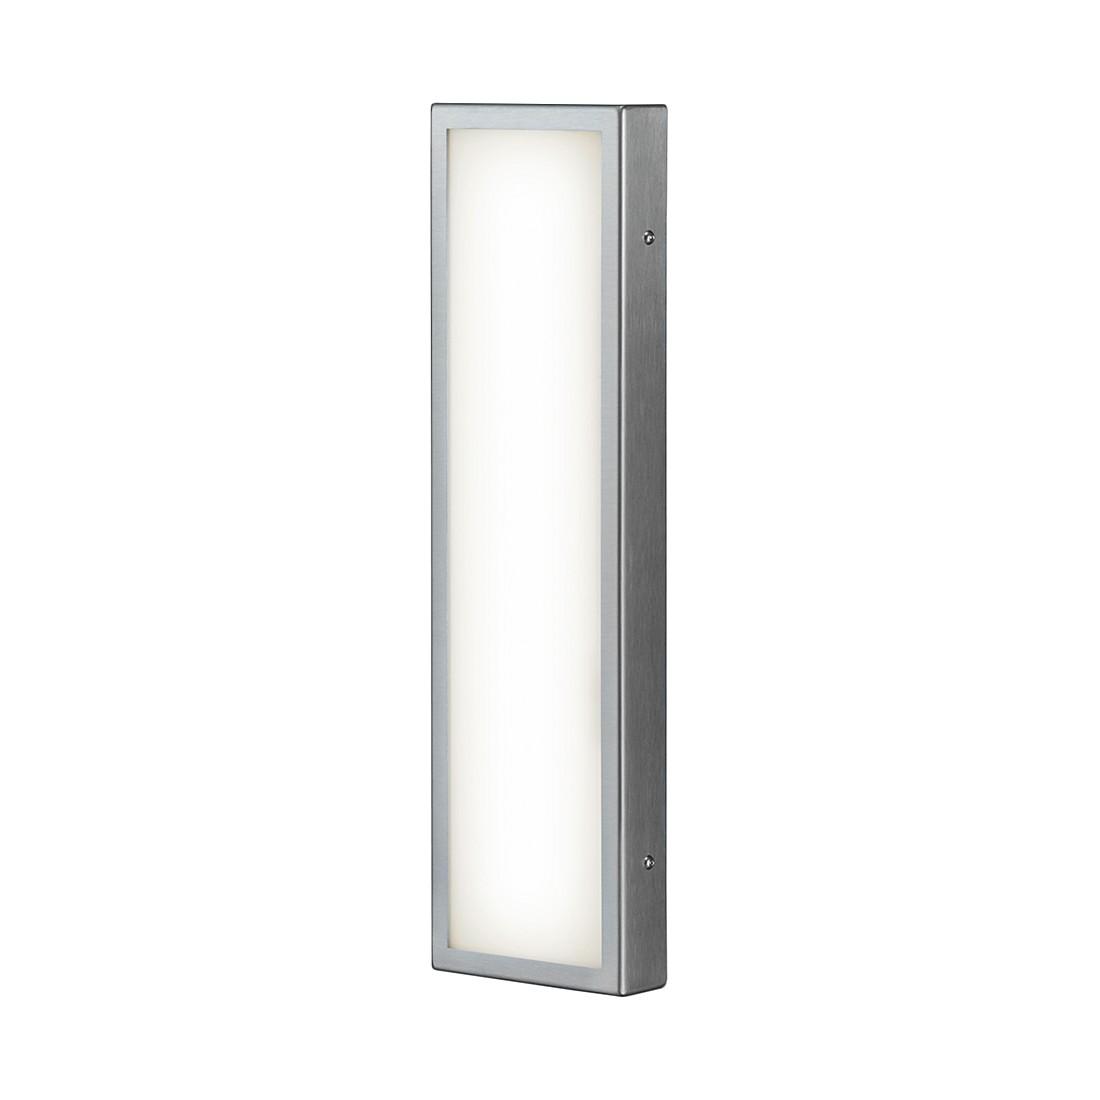 EEK A+, Wandleuchte SCALA LED – Metall/Kunststoff – Silber, Helestra bestellen